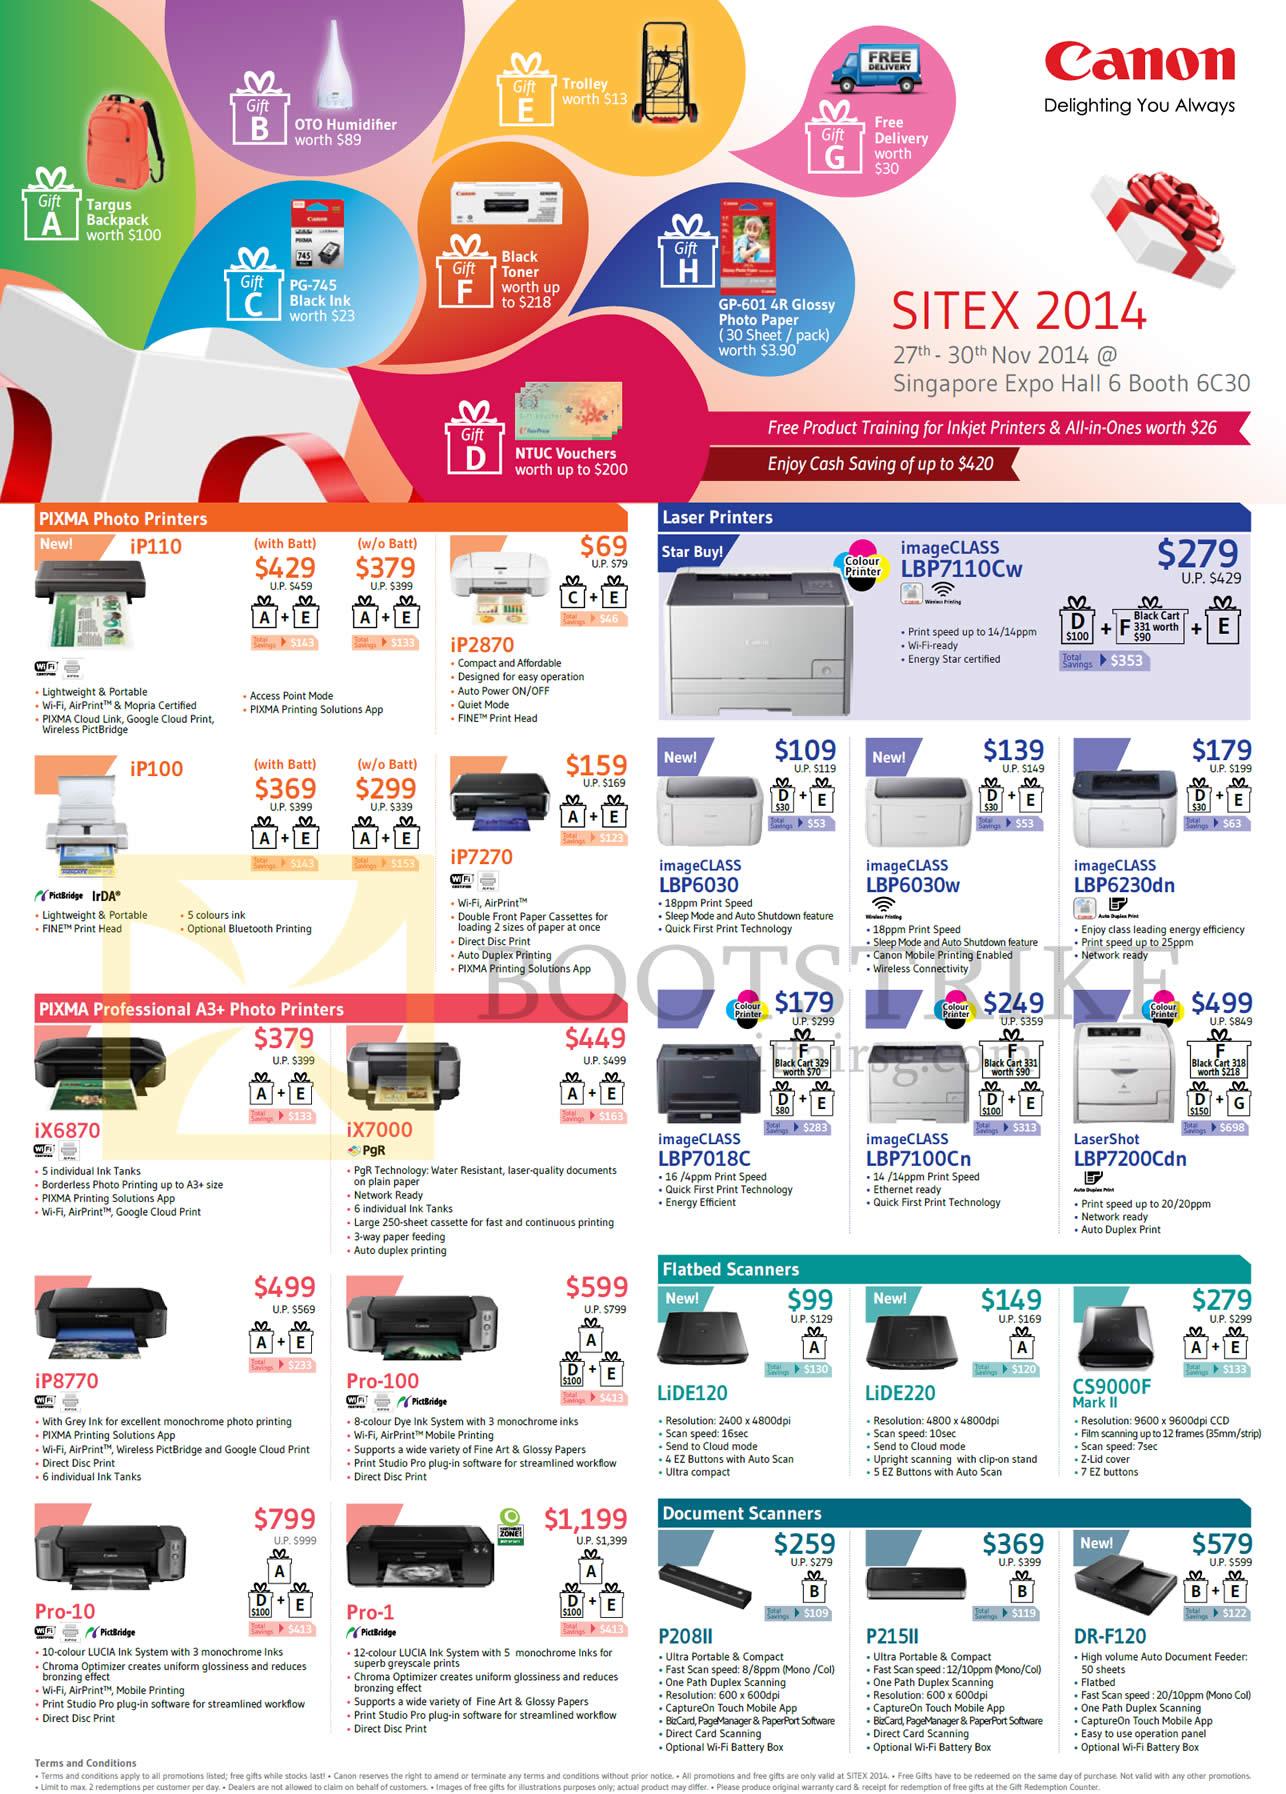 Canon Printers Pixma Photo, Scanners, IP110, IP100, IP7270, IX6870